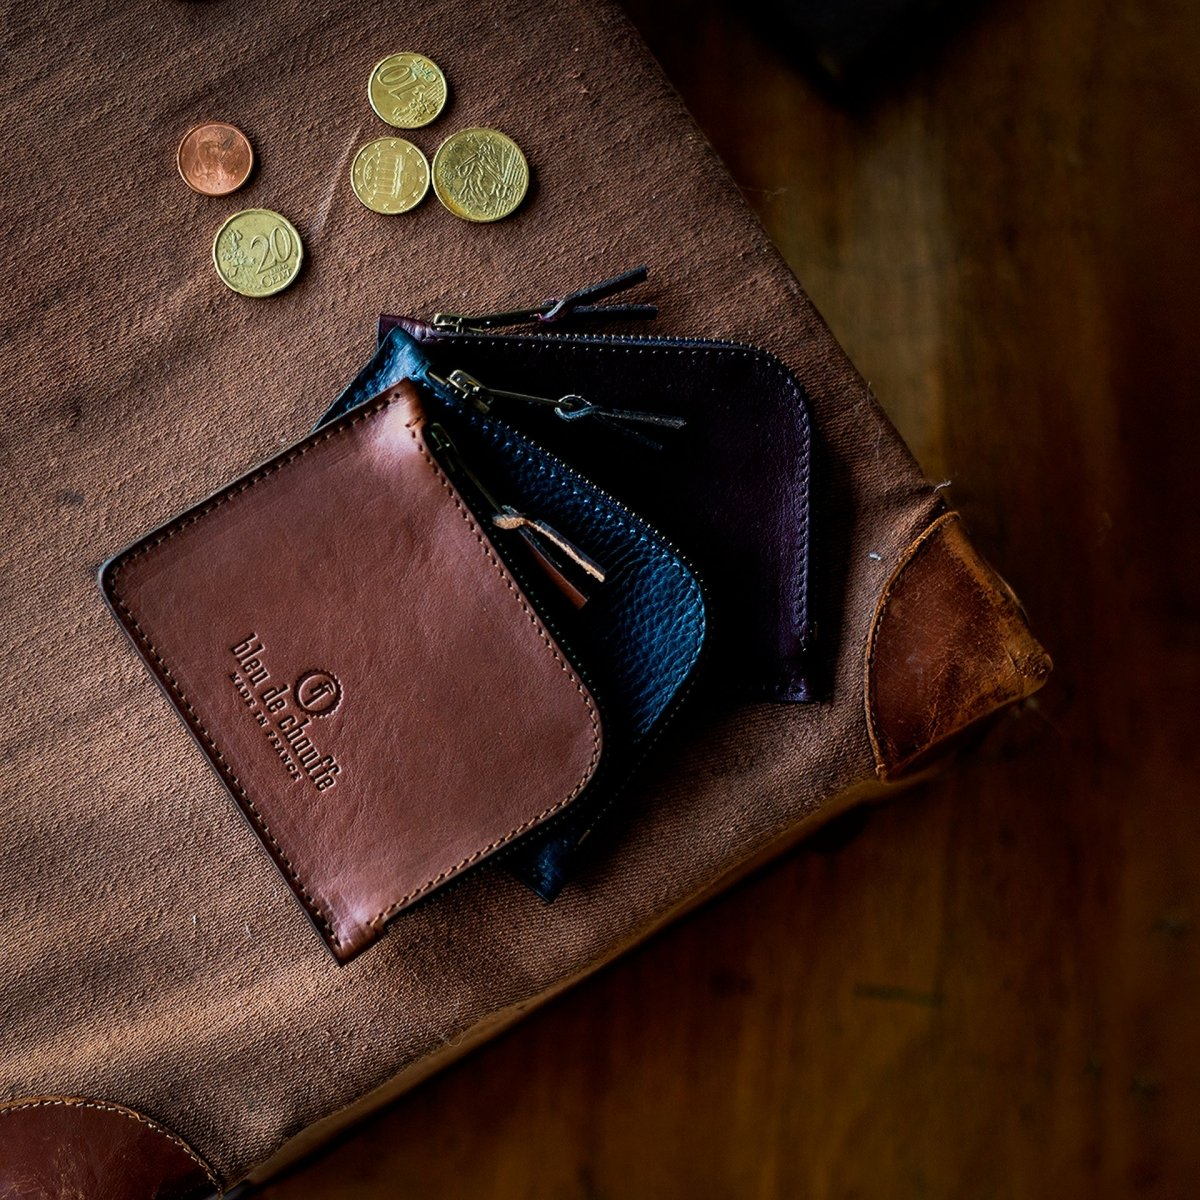 Porte monnaie zippé As / M - Noir (image n°6)